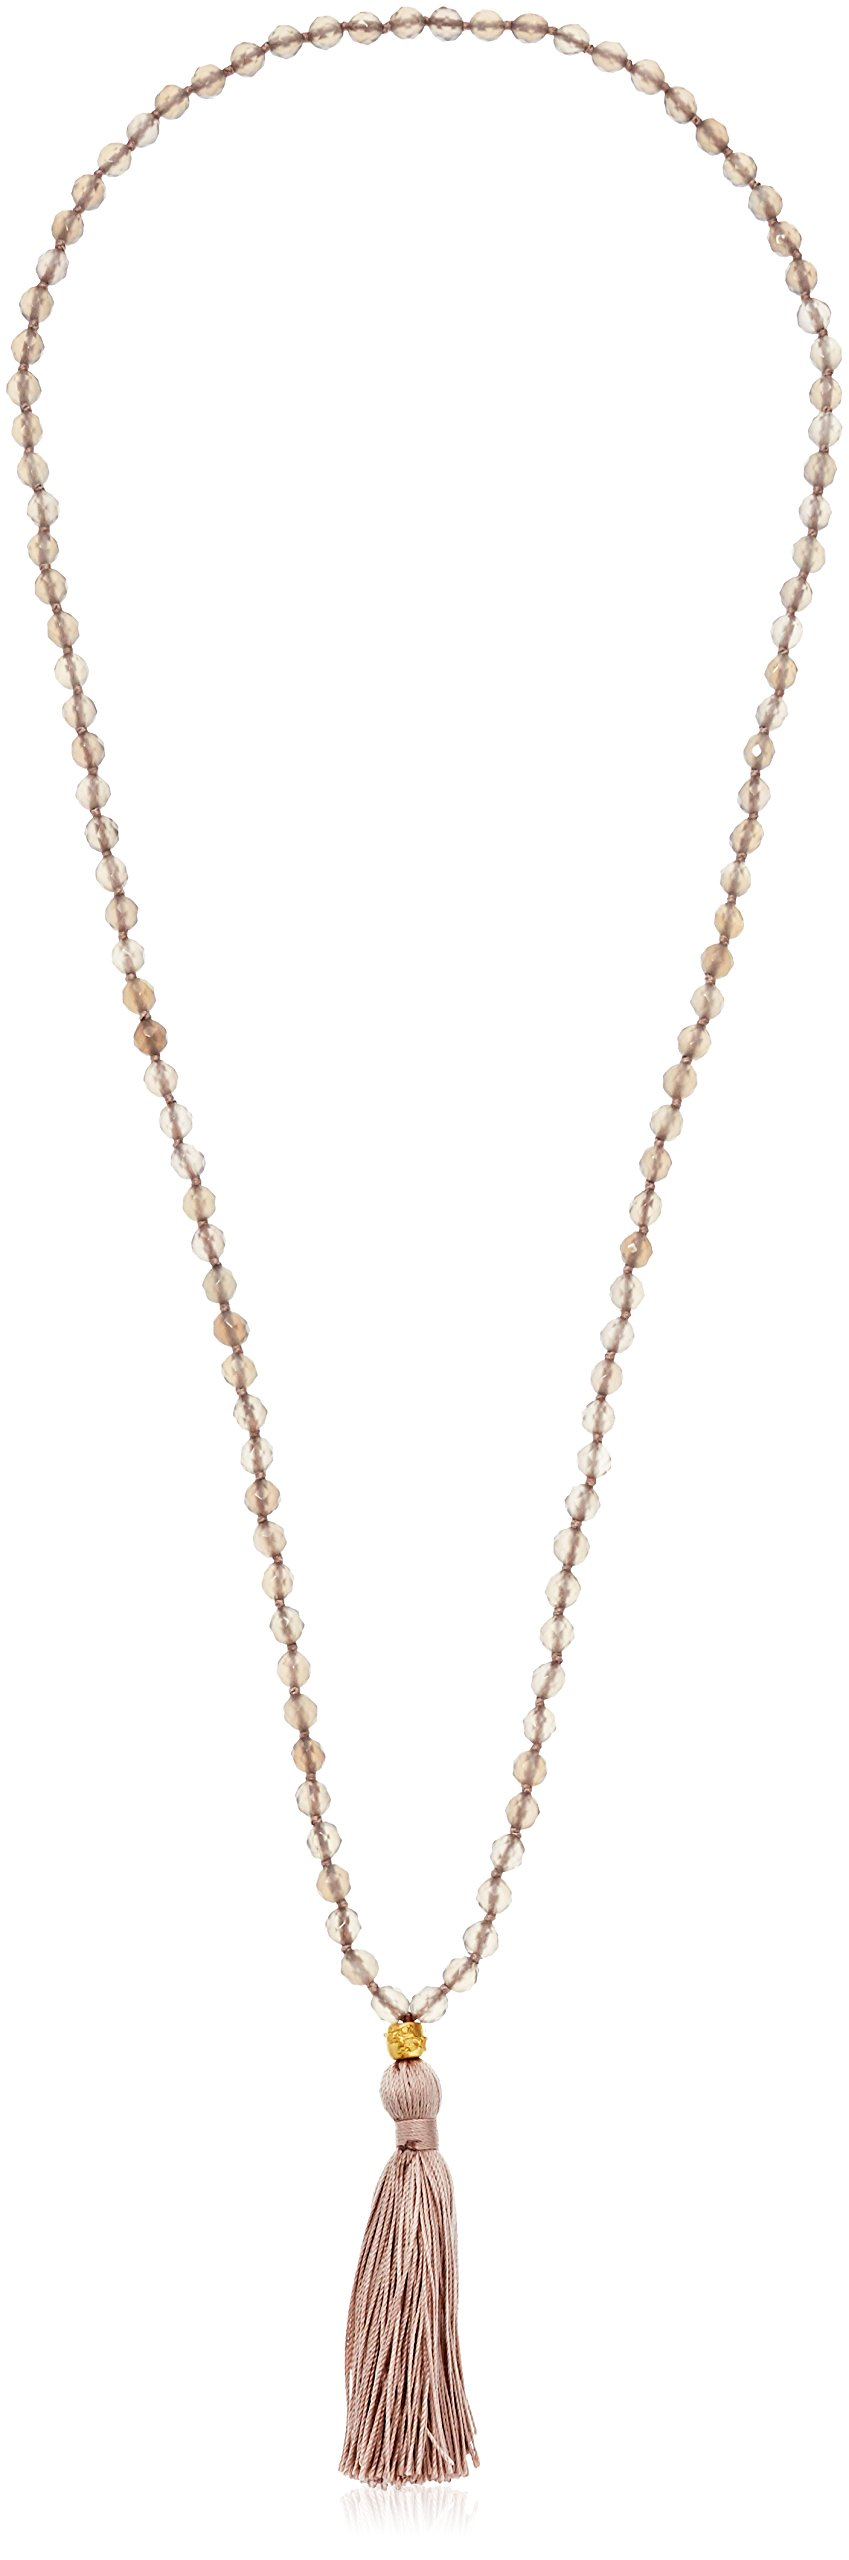 Satya Jewelry Grey Agate Gold Plated Cherry Blossom Mala Tassel Strand Necklace